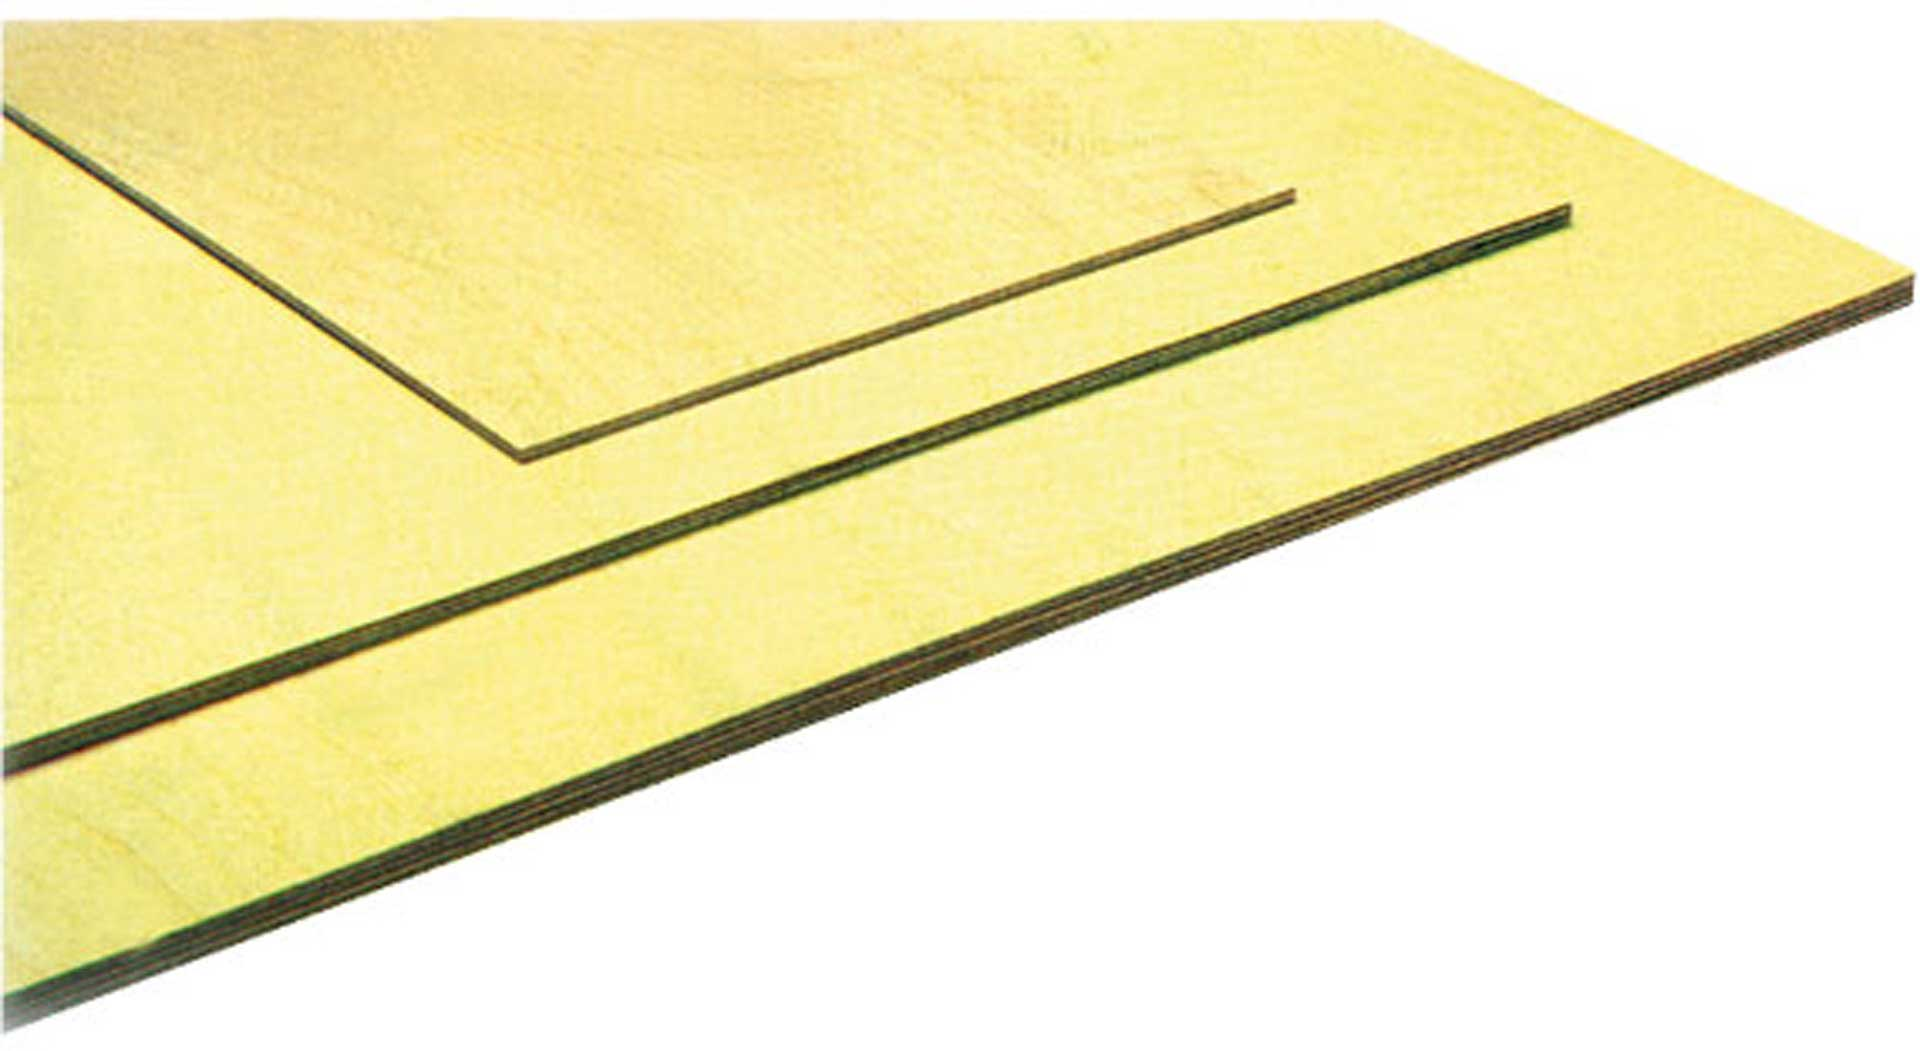 MODELLBAU LINDINGER BIRCH-WOOD 3,0/300/500MM